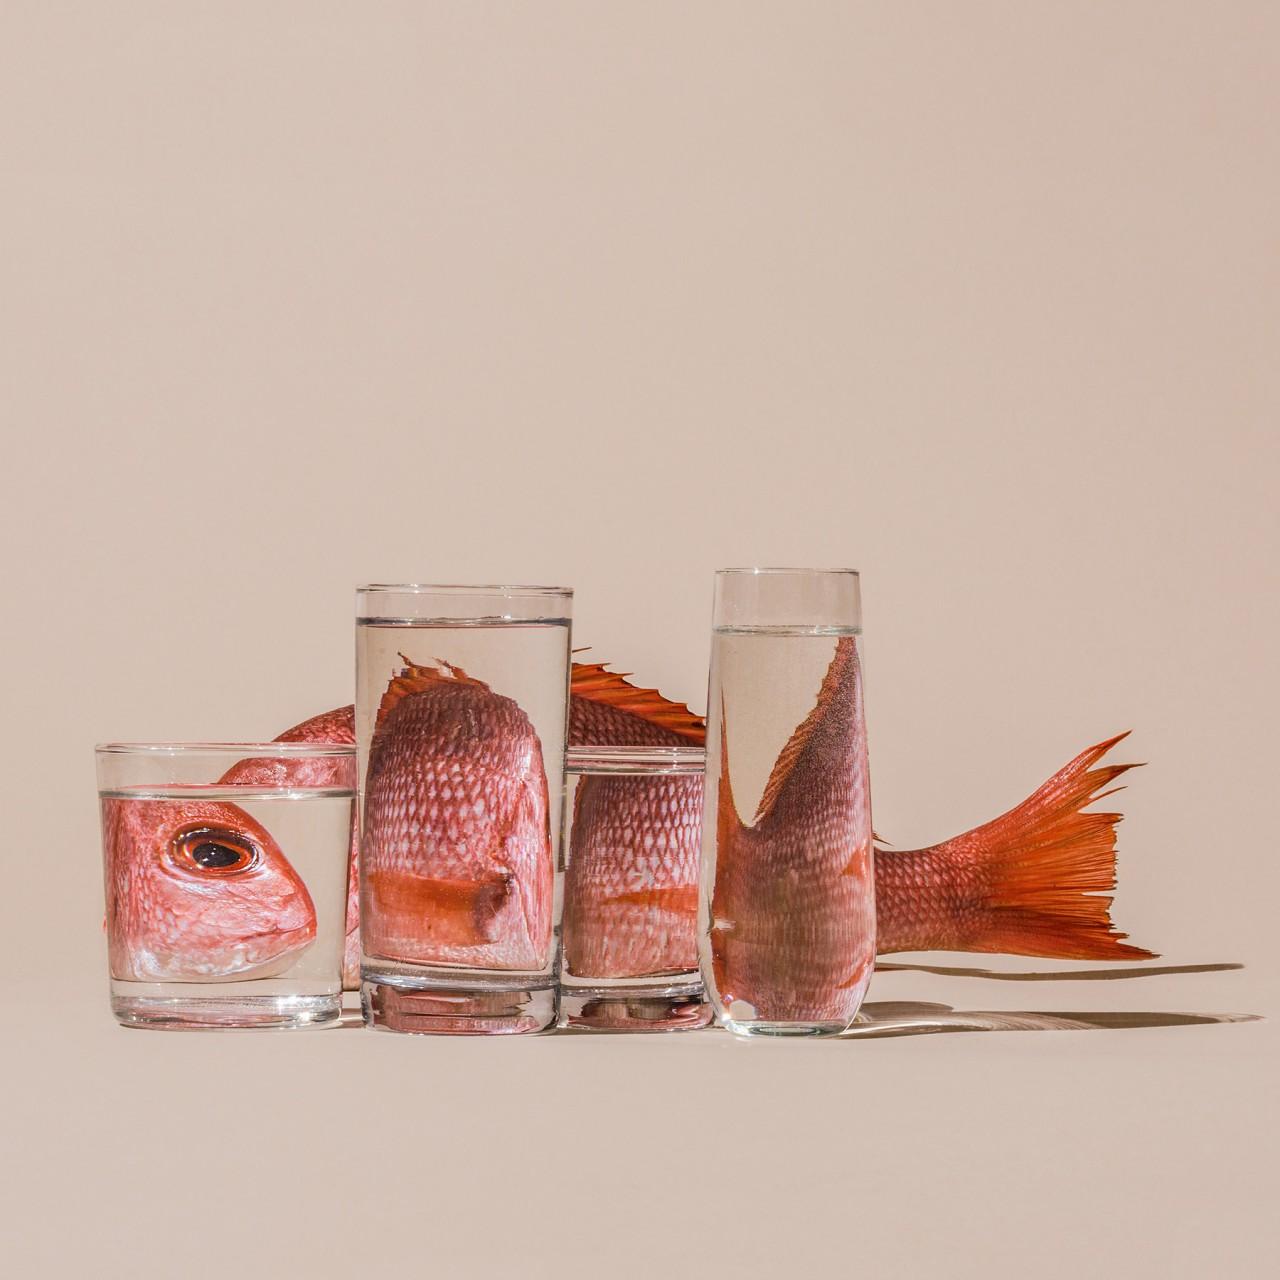 Fish-Behind-Water.SuzanneSaroff-640x640@2x